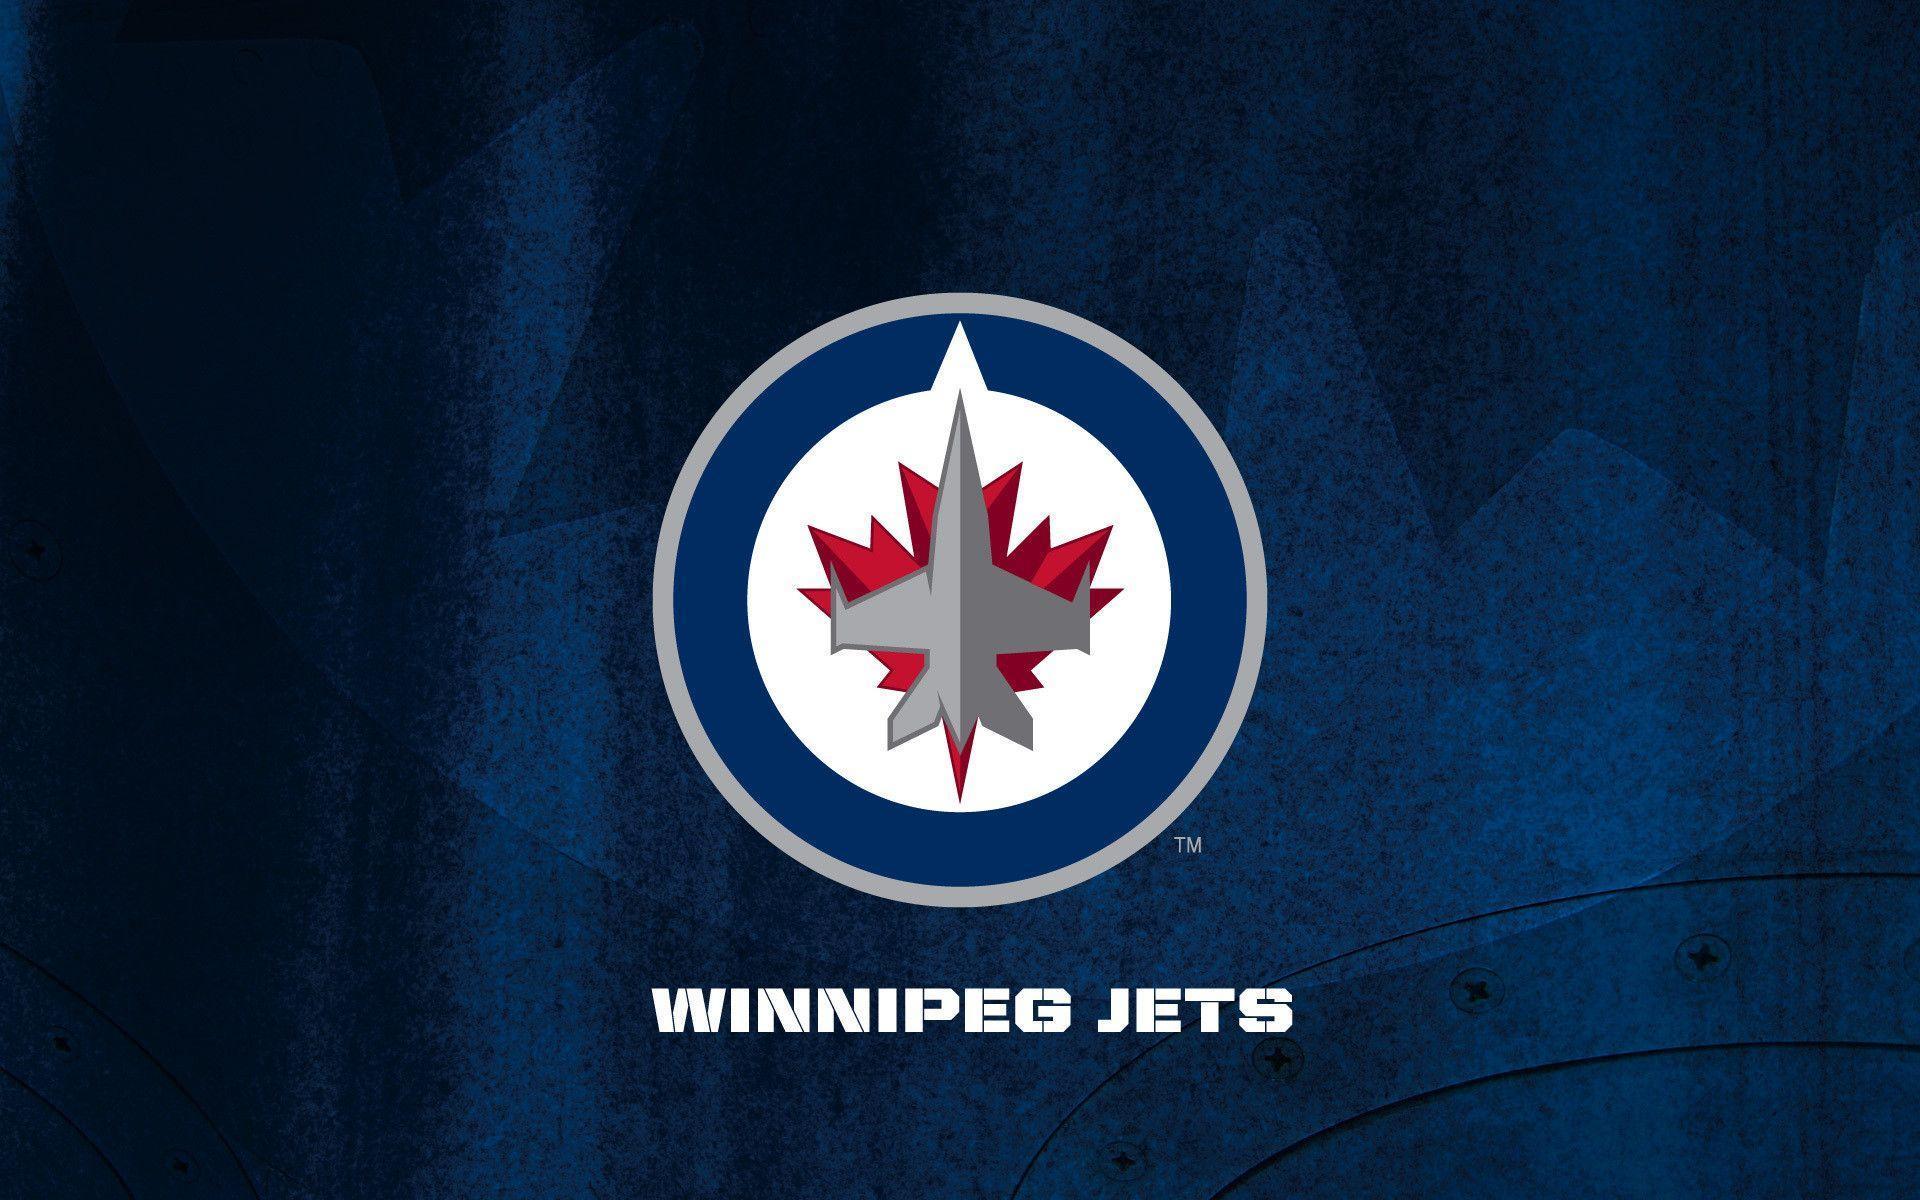 Winnipeg Jets Wallpapers Wallpaper Cave